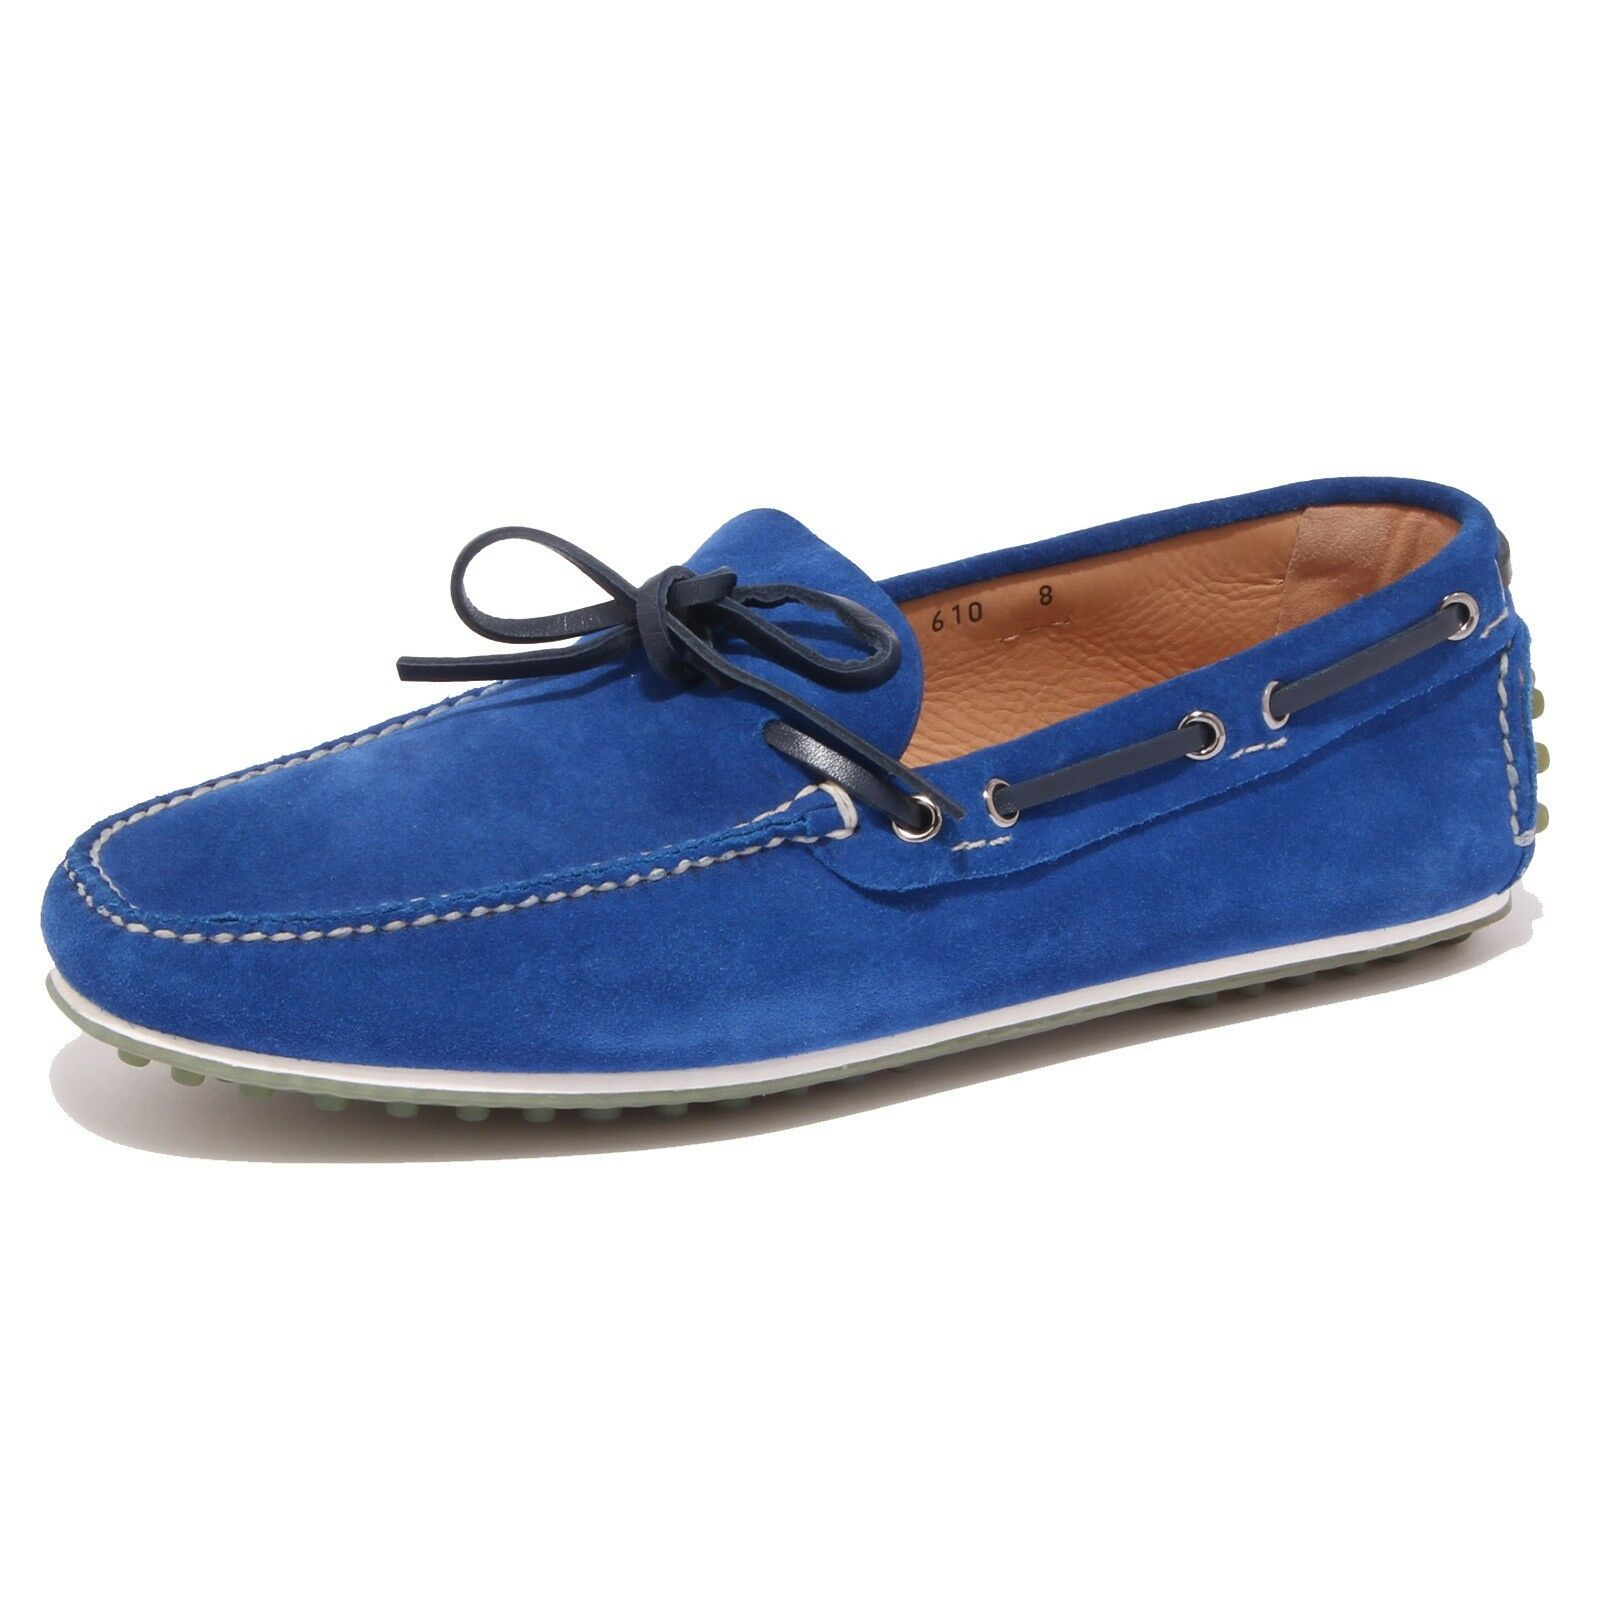 92523 mocassino CAR SHOE scarpa uomo loafer shoes men men men d05df1